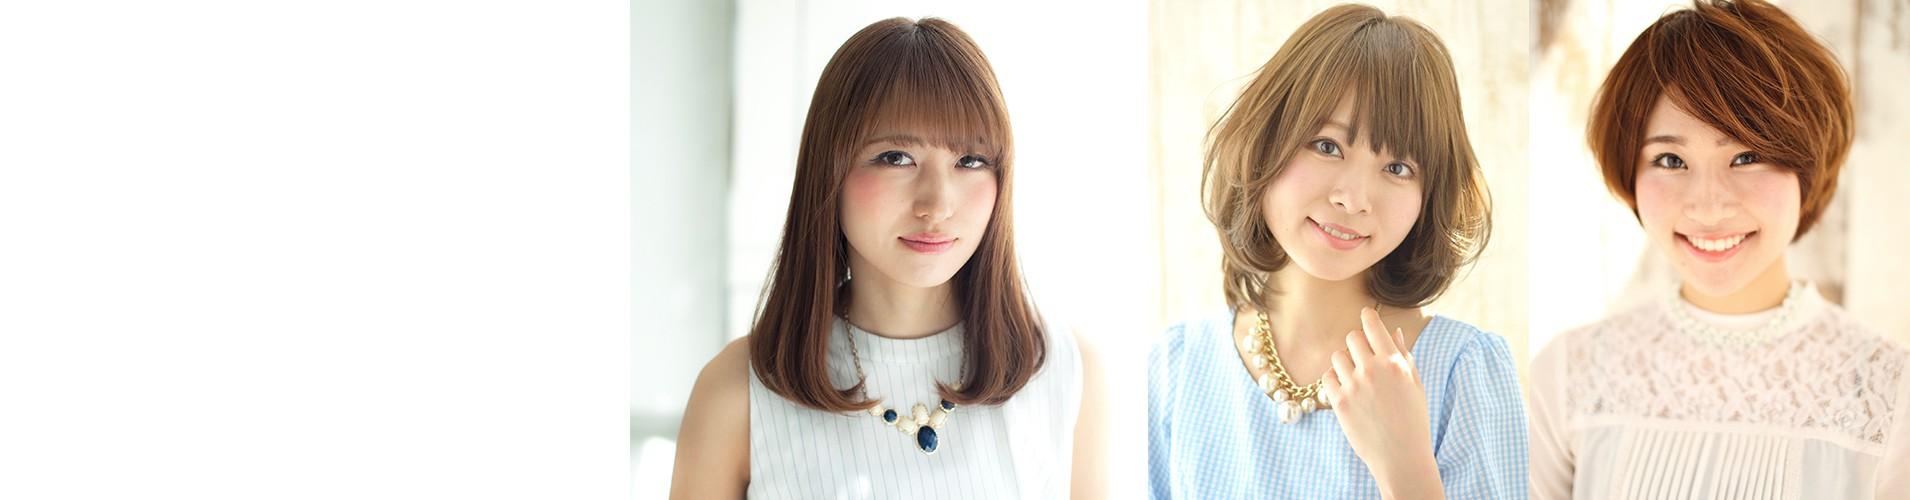 joji takigami makes hair style